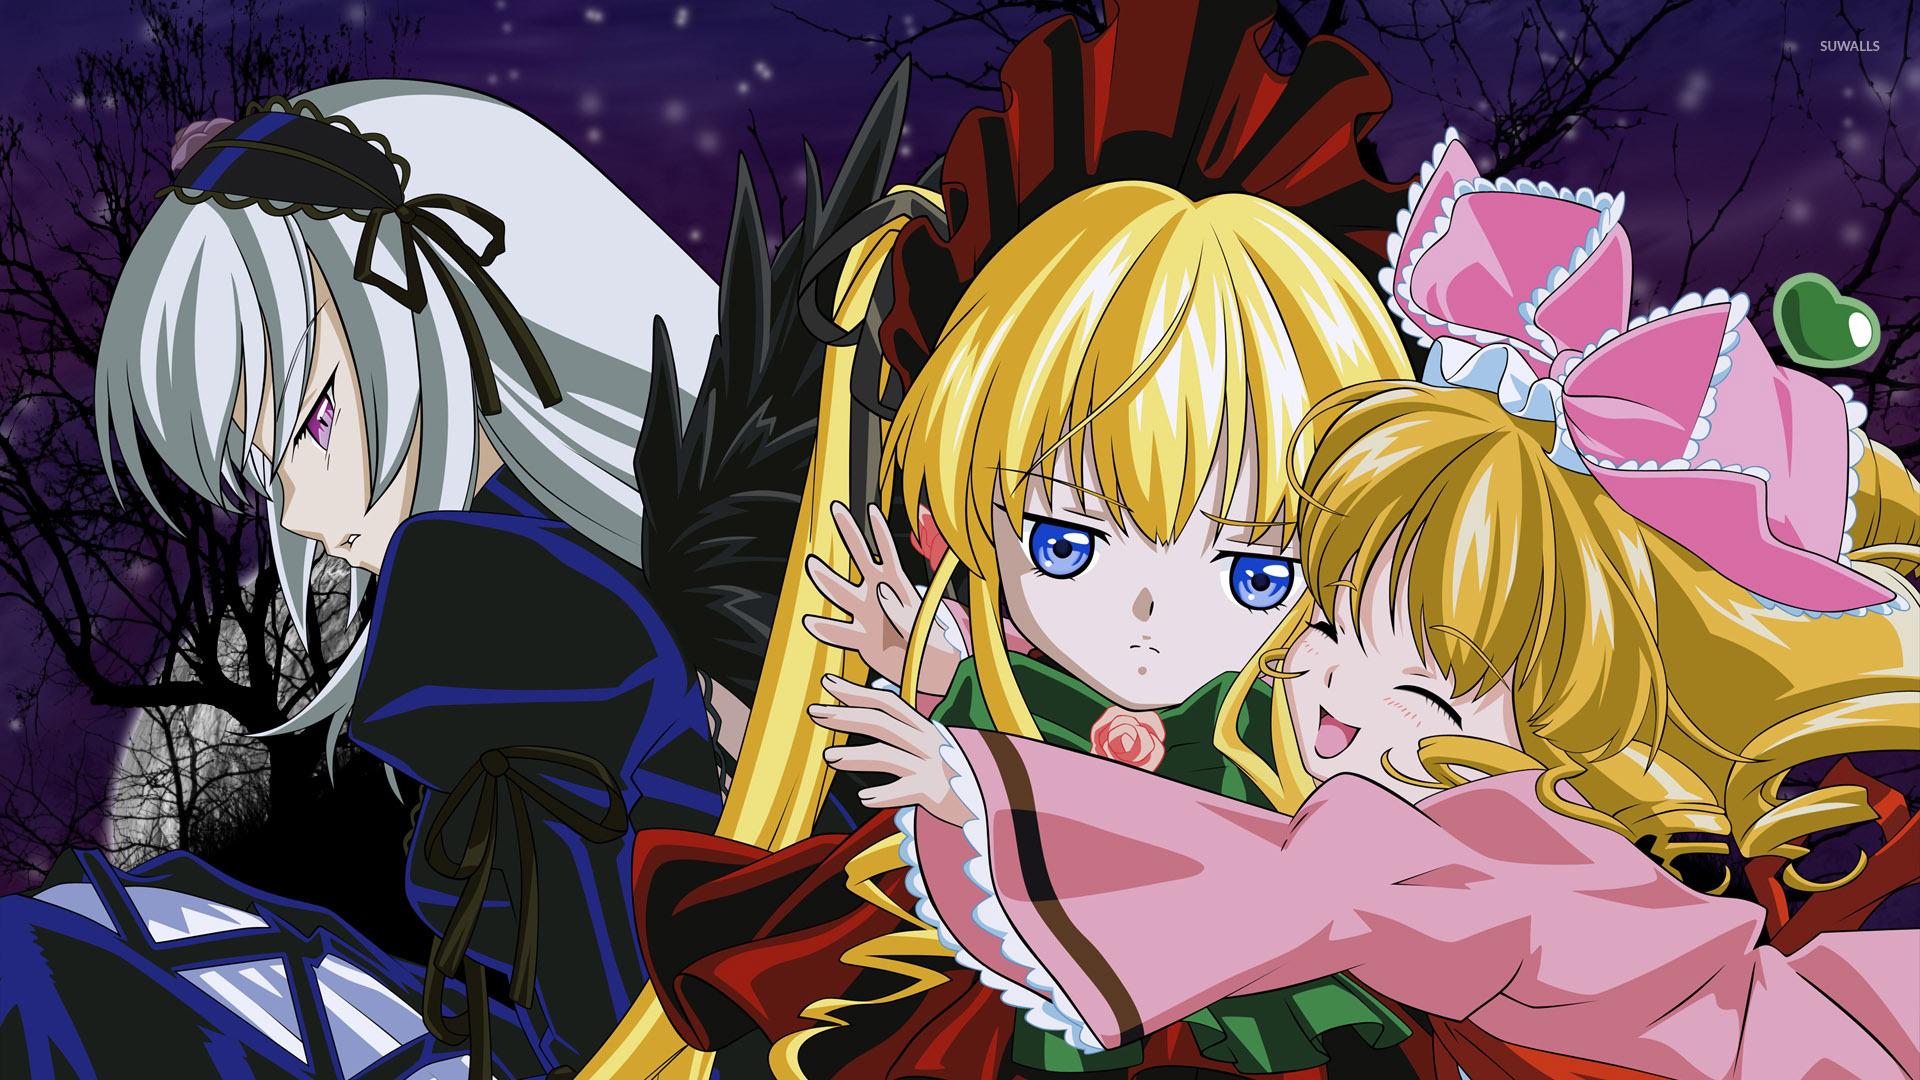 Rozen Maiden [2] wallpaper - Anime wallpapers - #34371